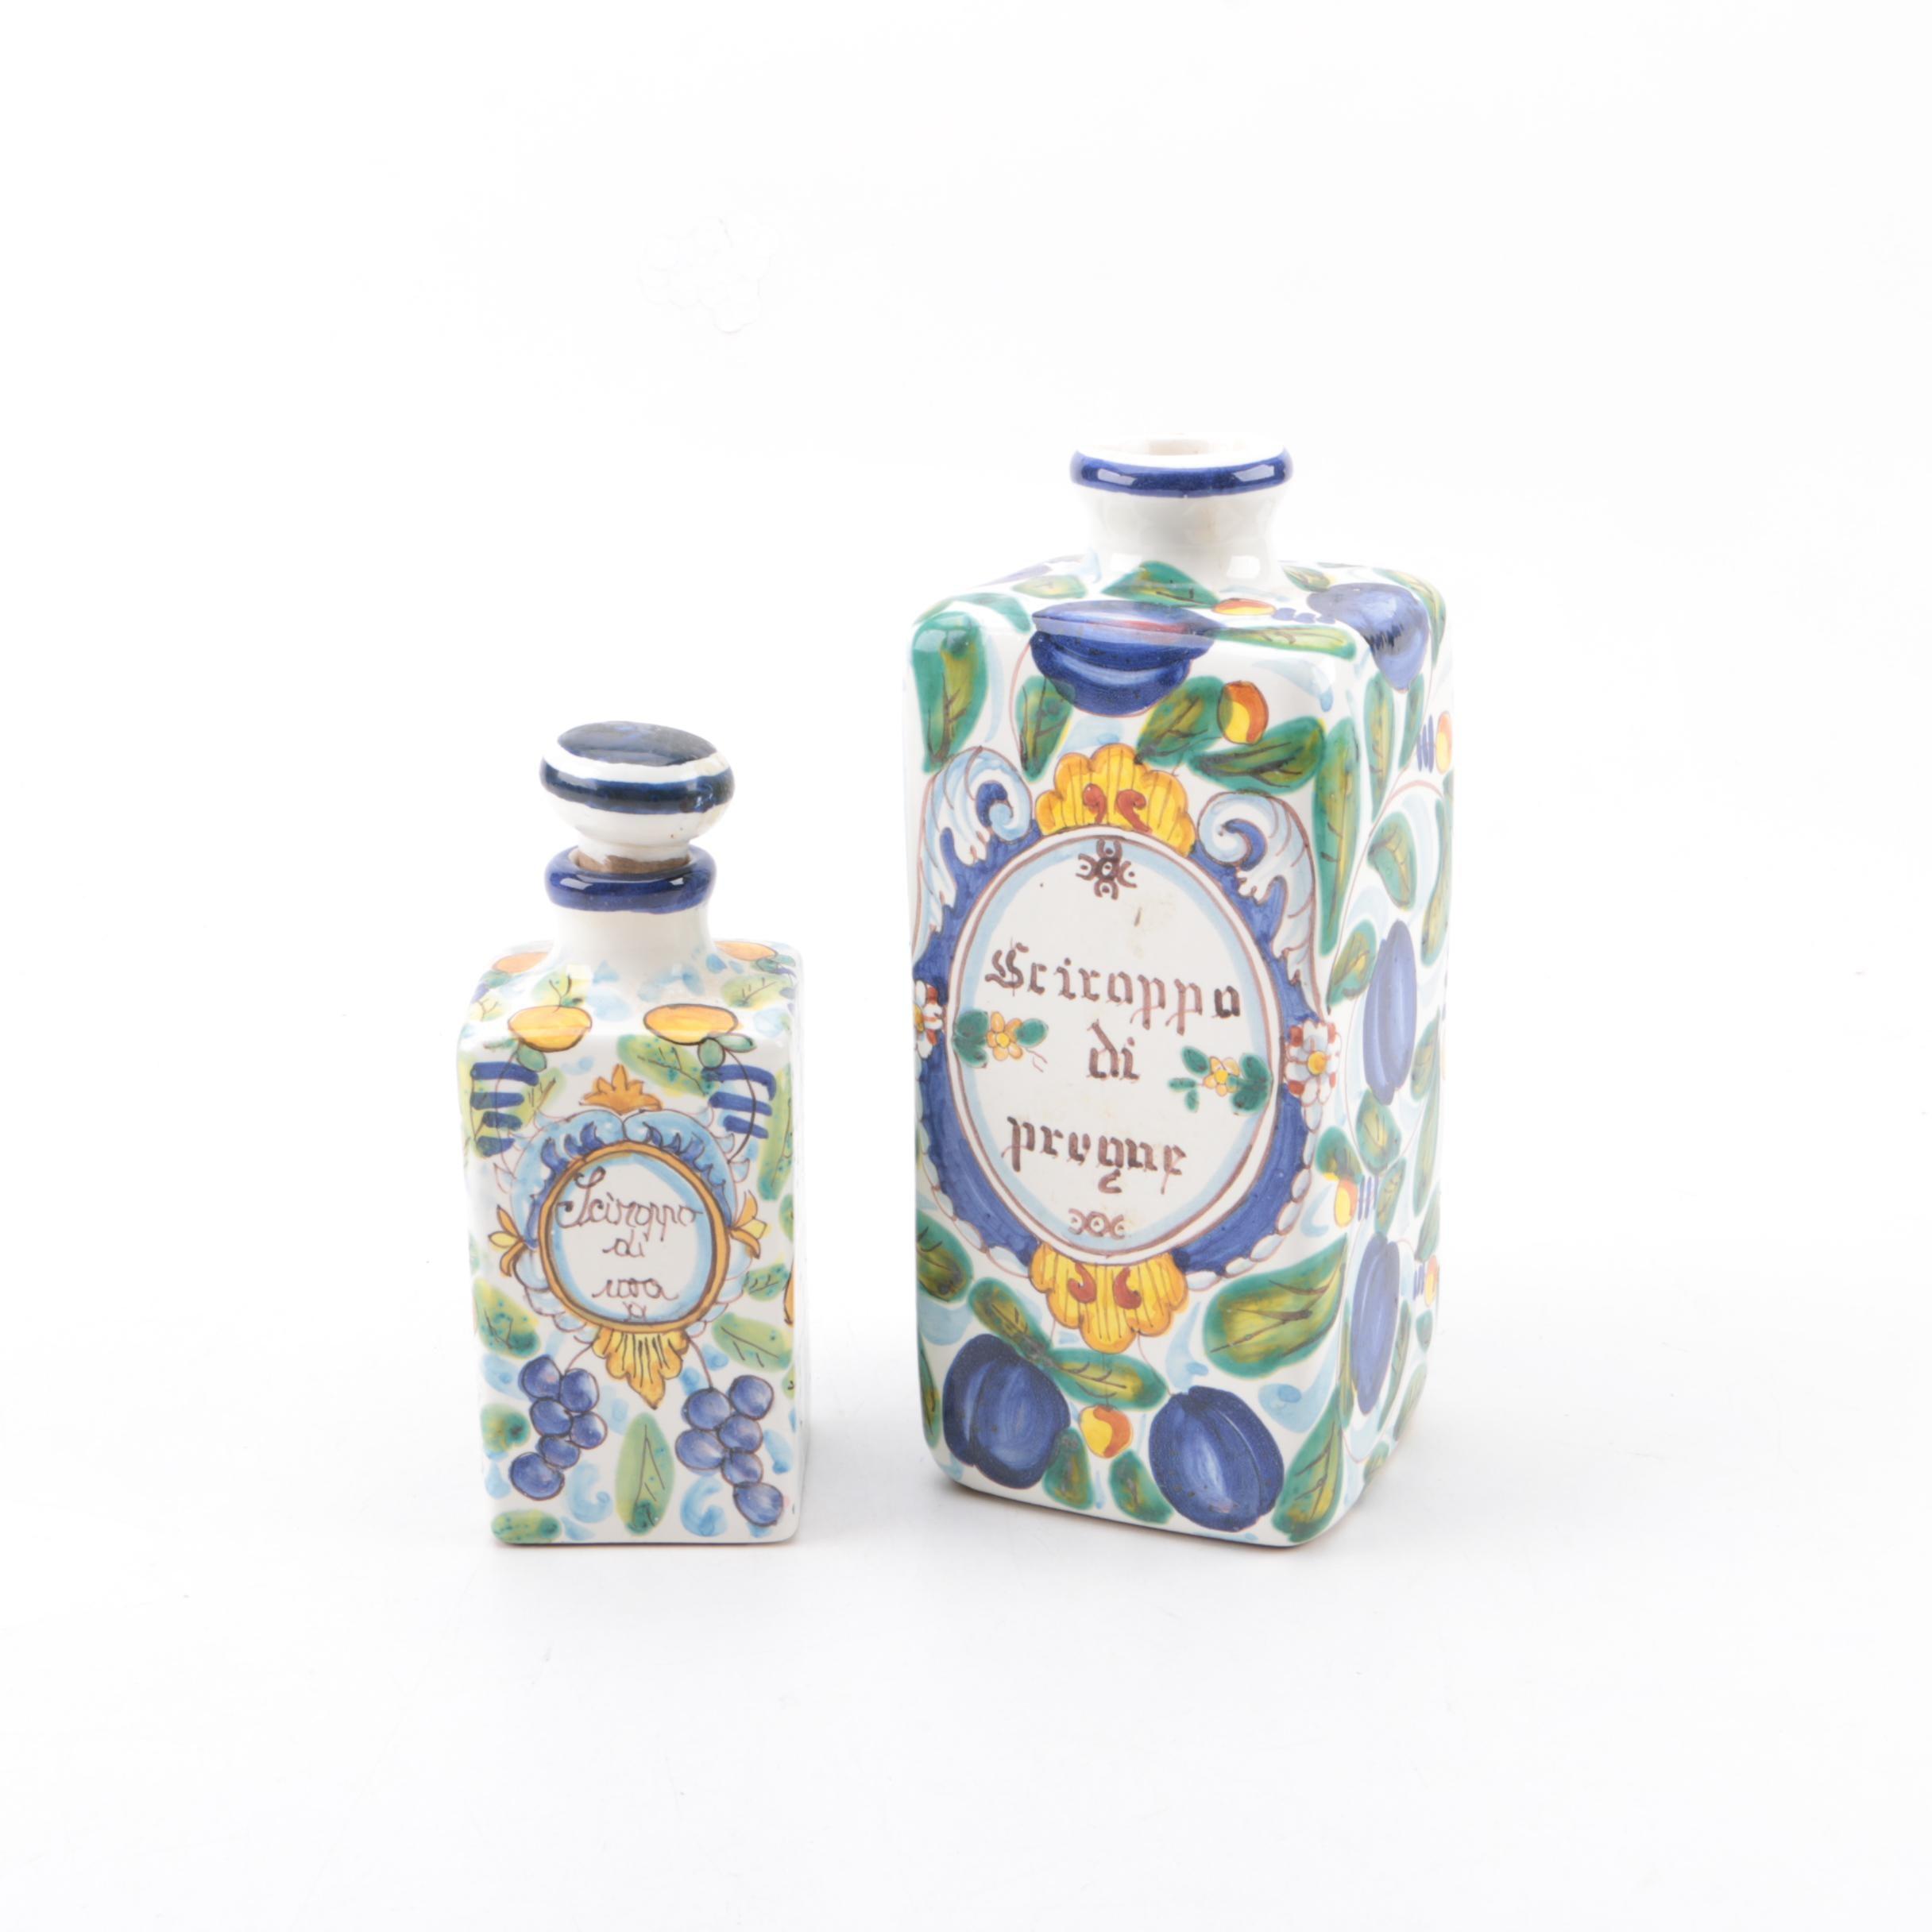 IMA Ceramiche Artische Italian Maiolica Bottles